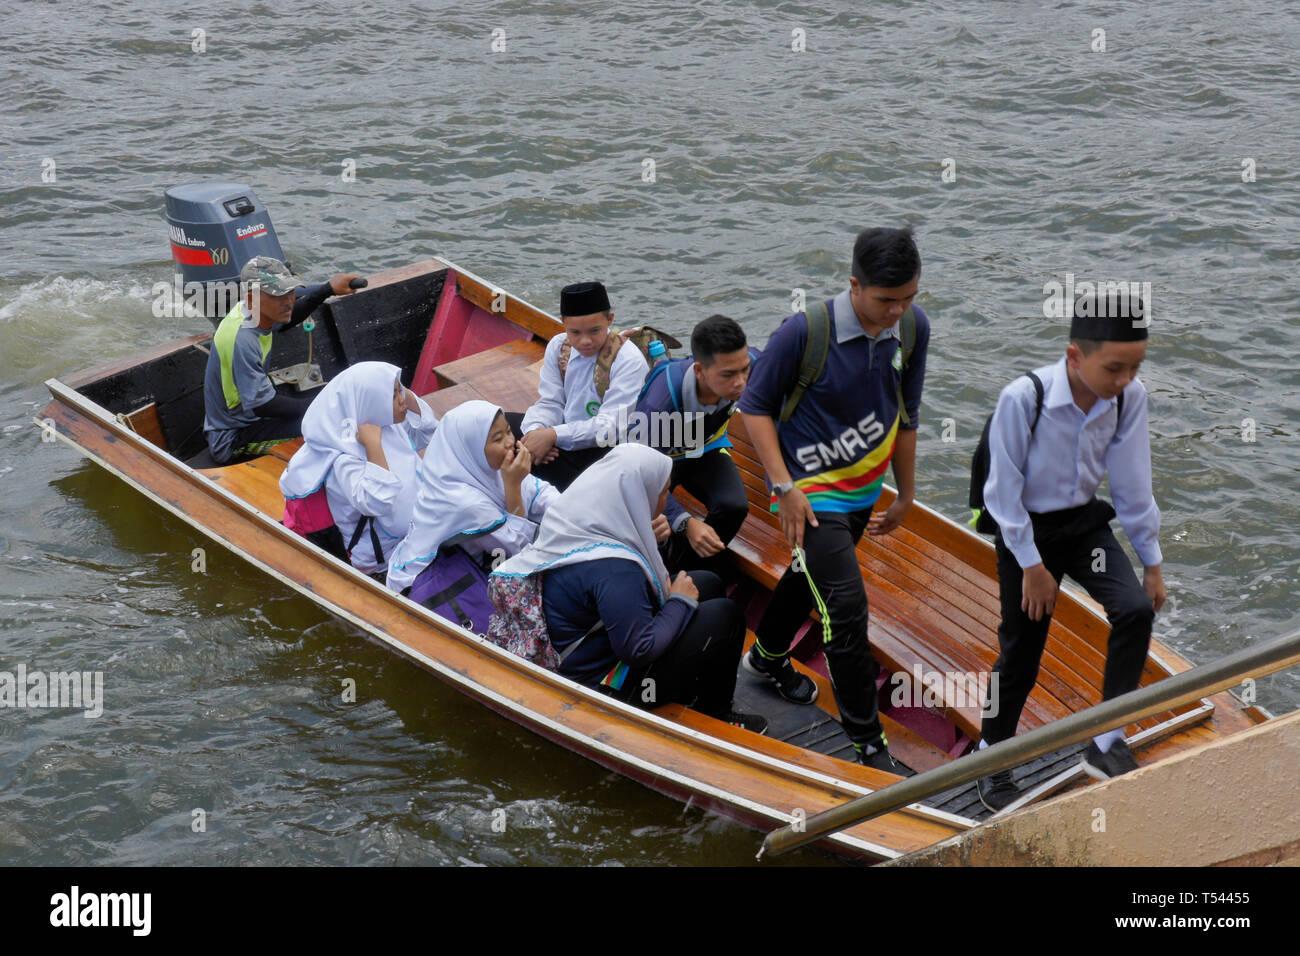 Water taxi carrying Muslim students on Brunei River, Bandar Seri Begawan, Sultanate of Brunei - Stock Image